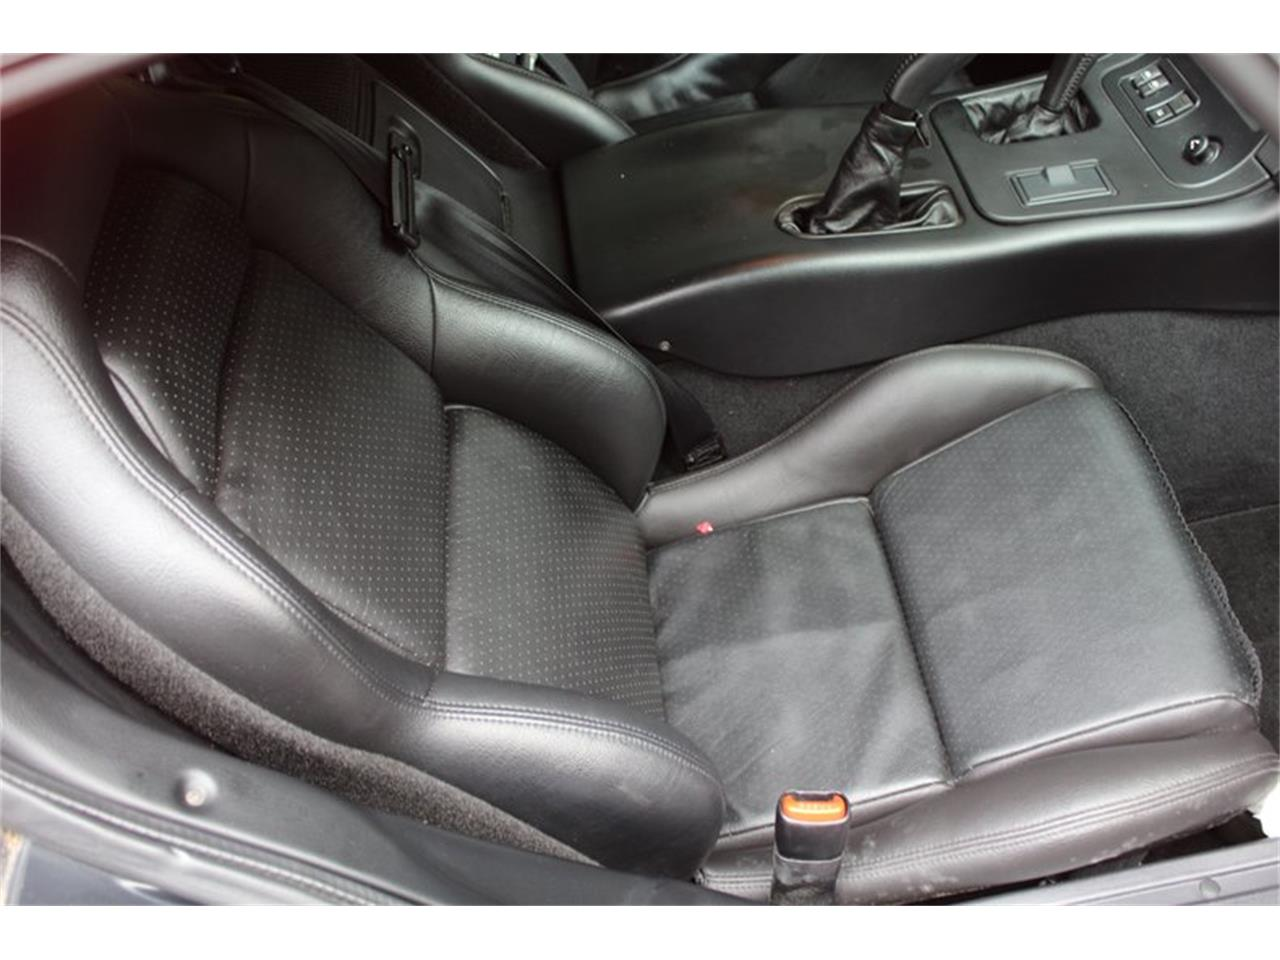 1997 Dodge Viper (CC-1258014) for sale in Roslyn, New York